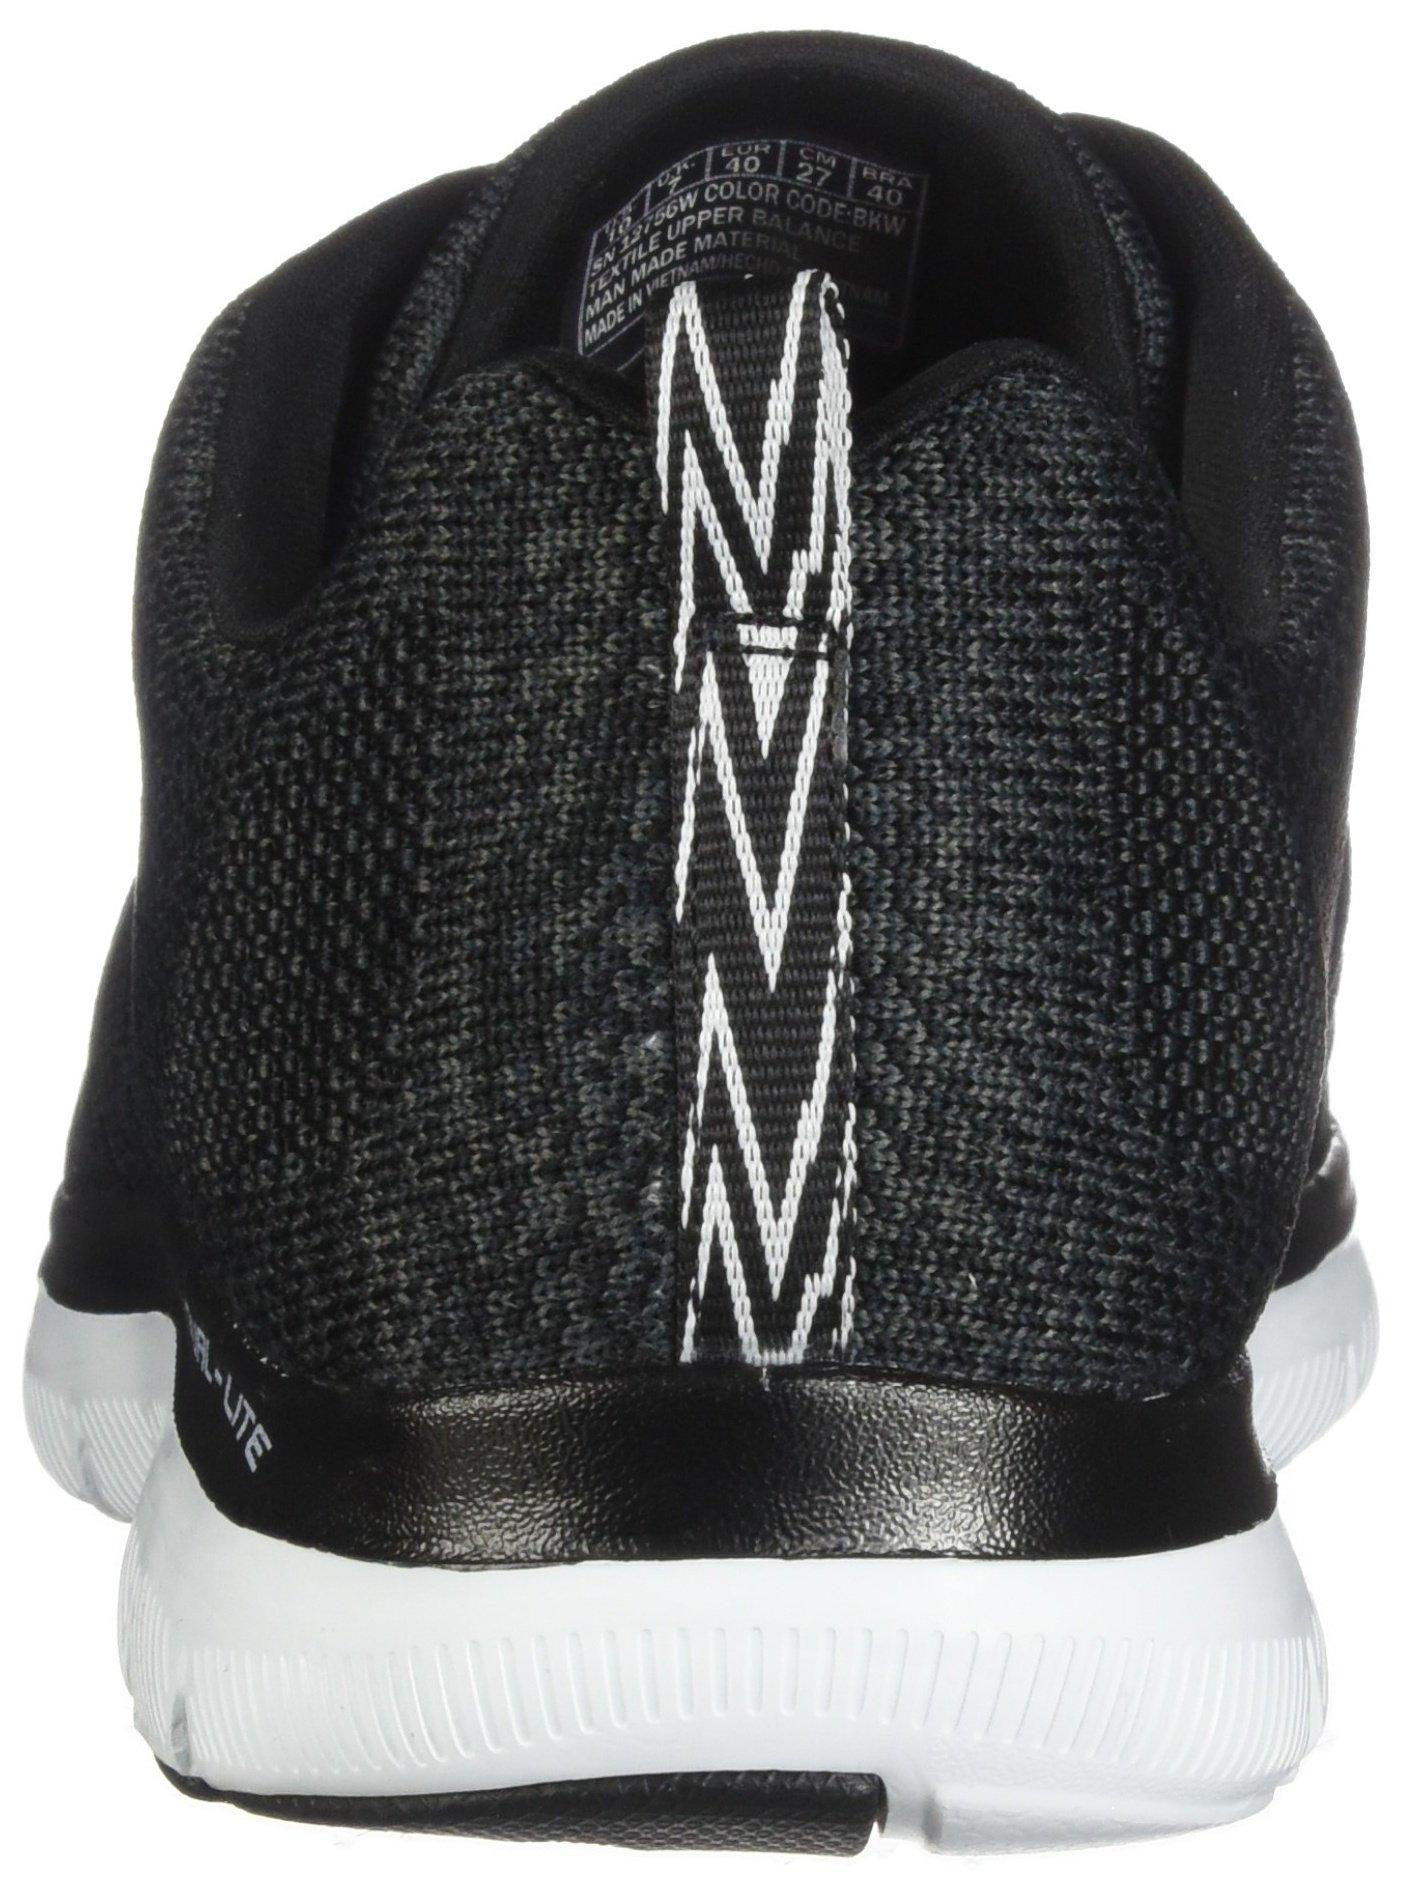 Skechers Women's Flex Appeal 2.0 High Energy Multisport Outdoor Shoes